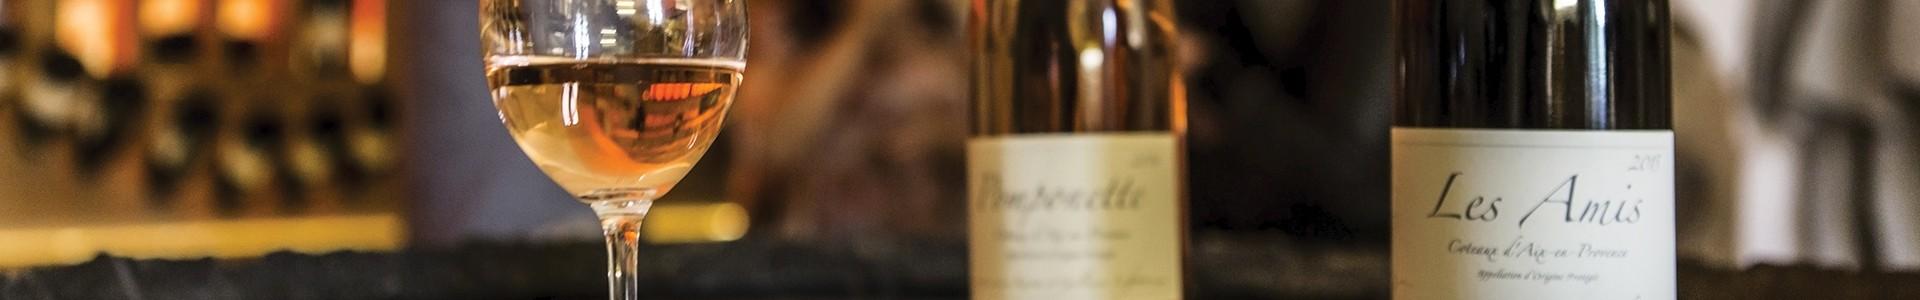 Domaine viticole de Sulauze